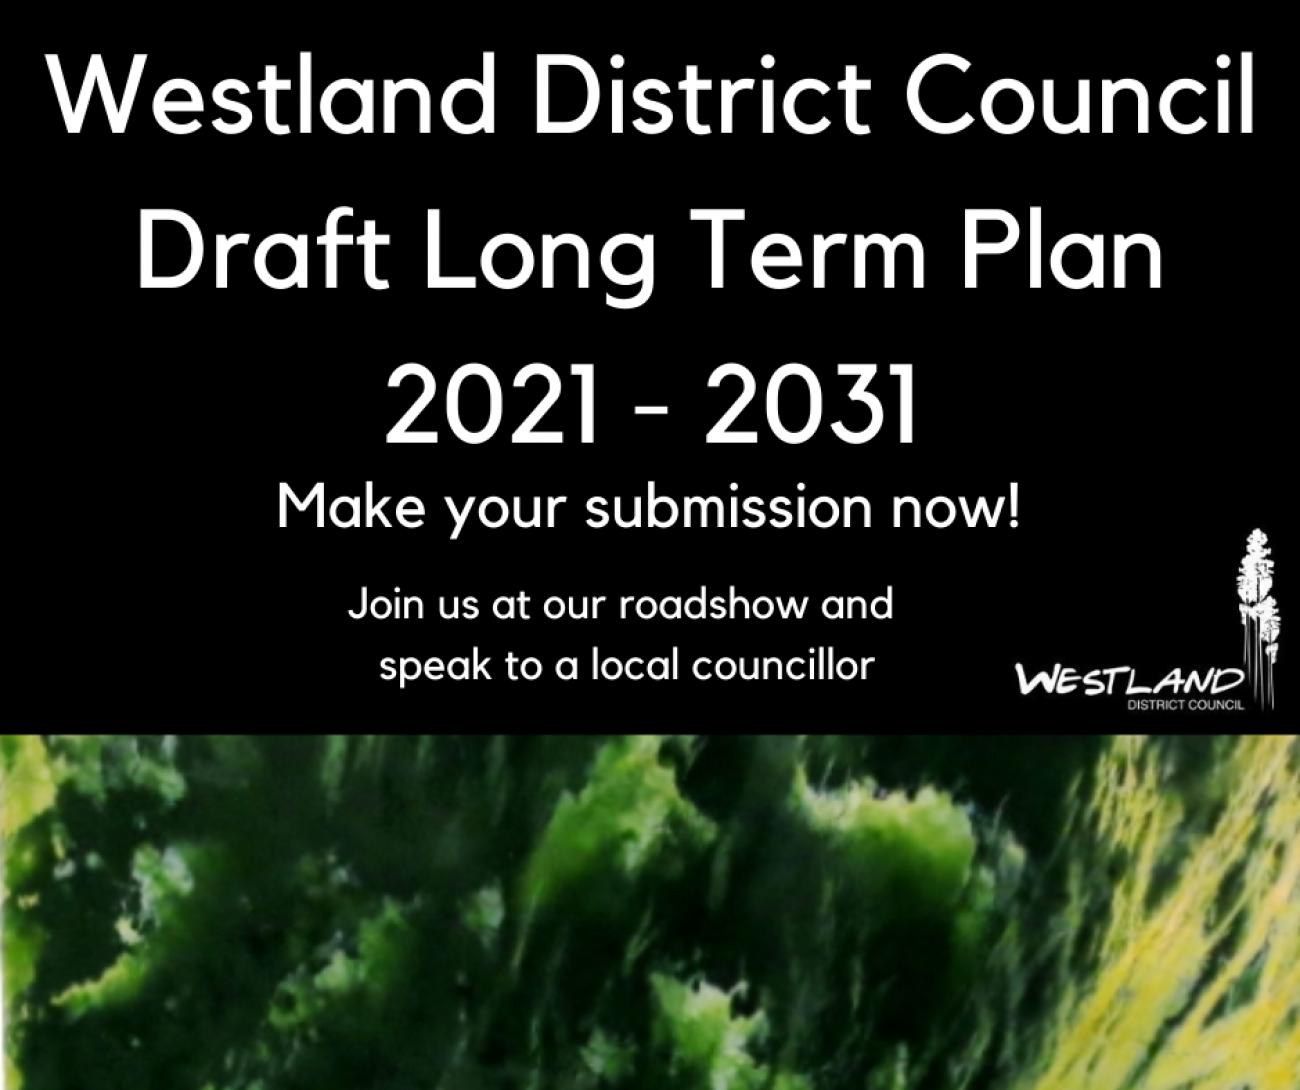 May / June 2021 Council Meetings